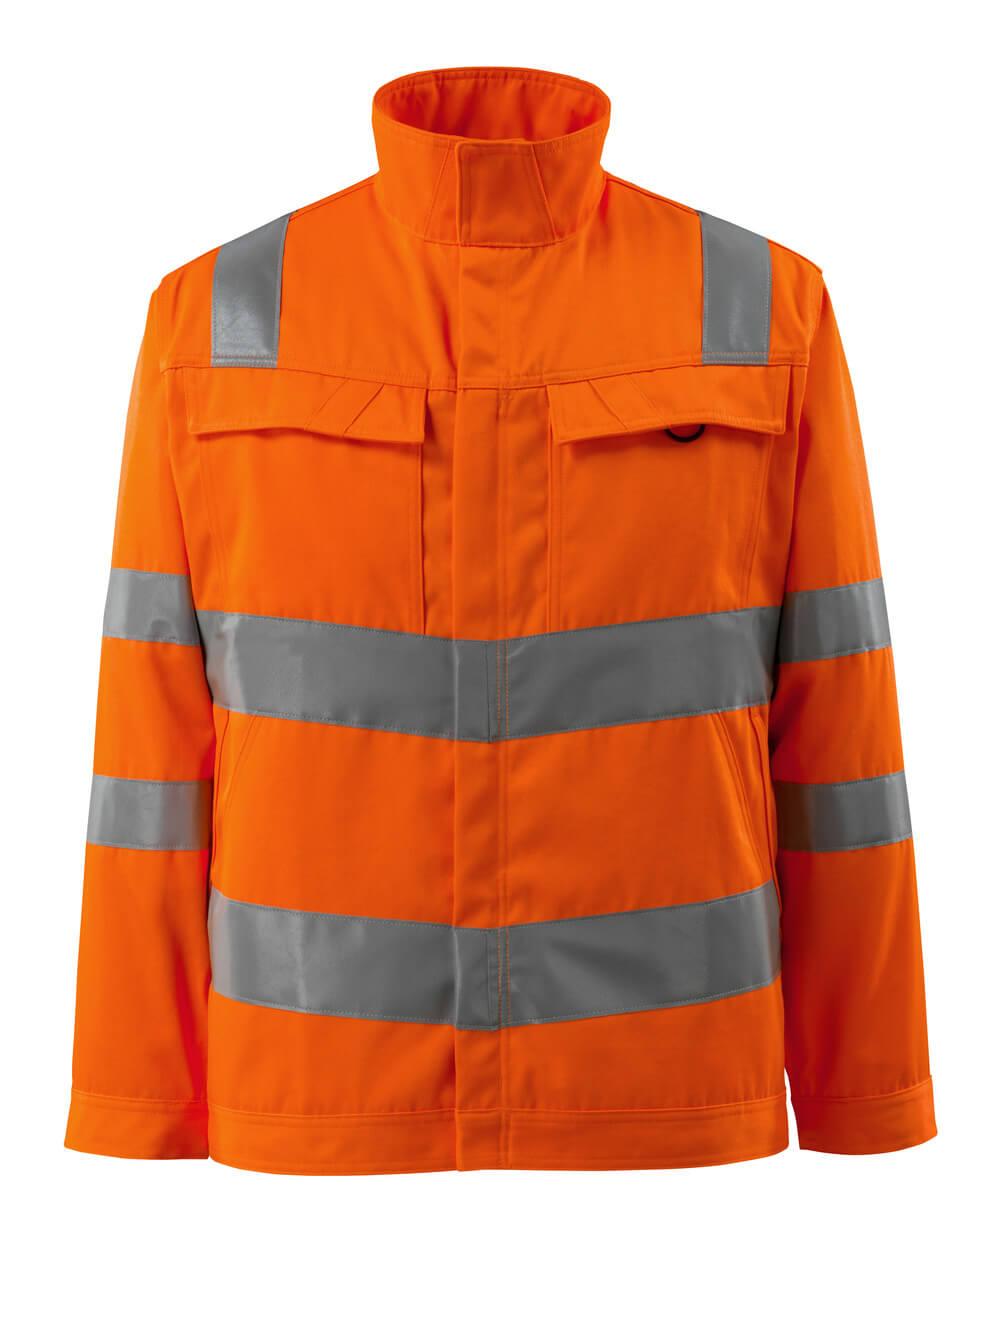 16909-860-14 Jacket - hi-vis orange